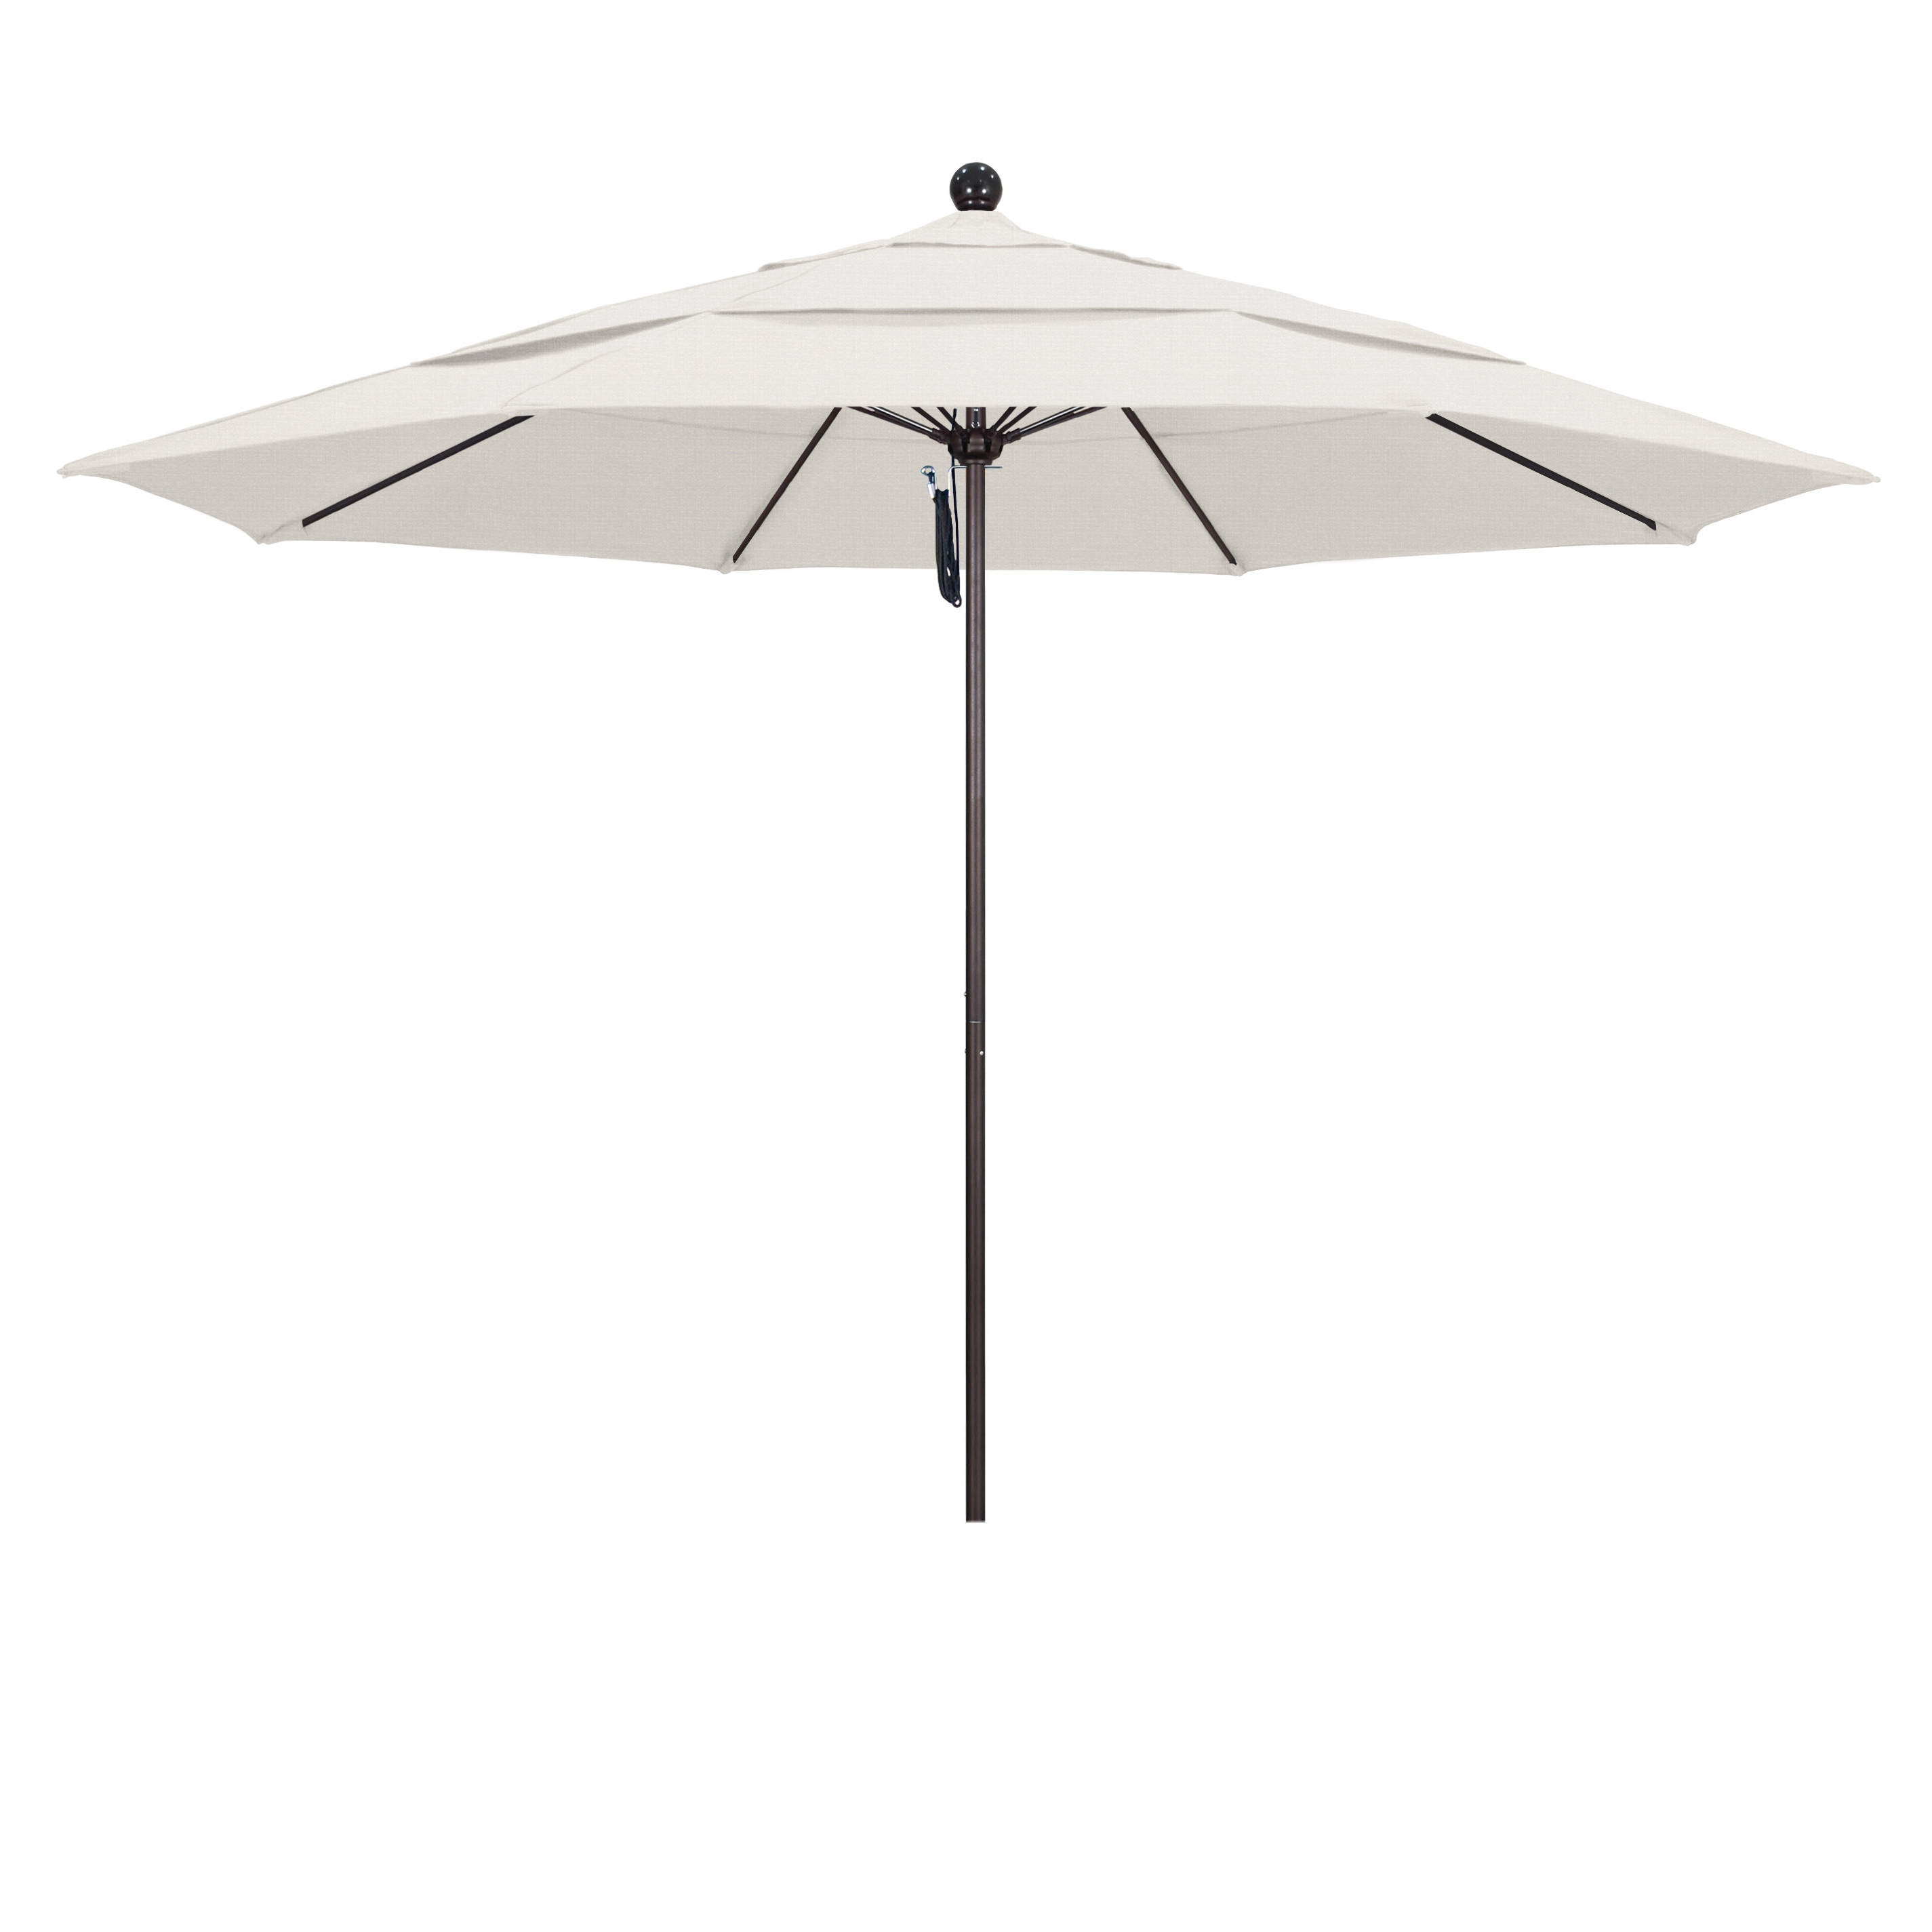 Cardine Market Umbrellas With Regard To 2020 Davenport 11' Market Umbrella (View 13 of 20)